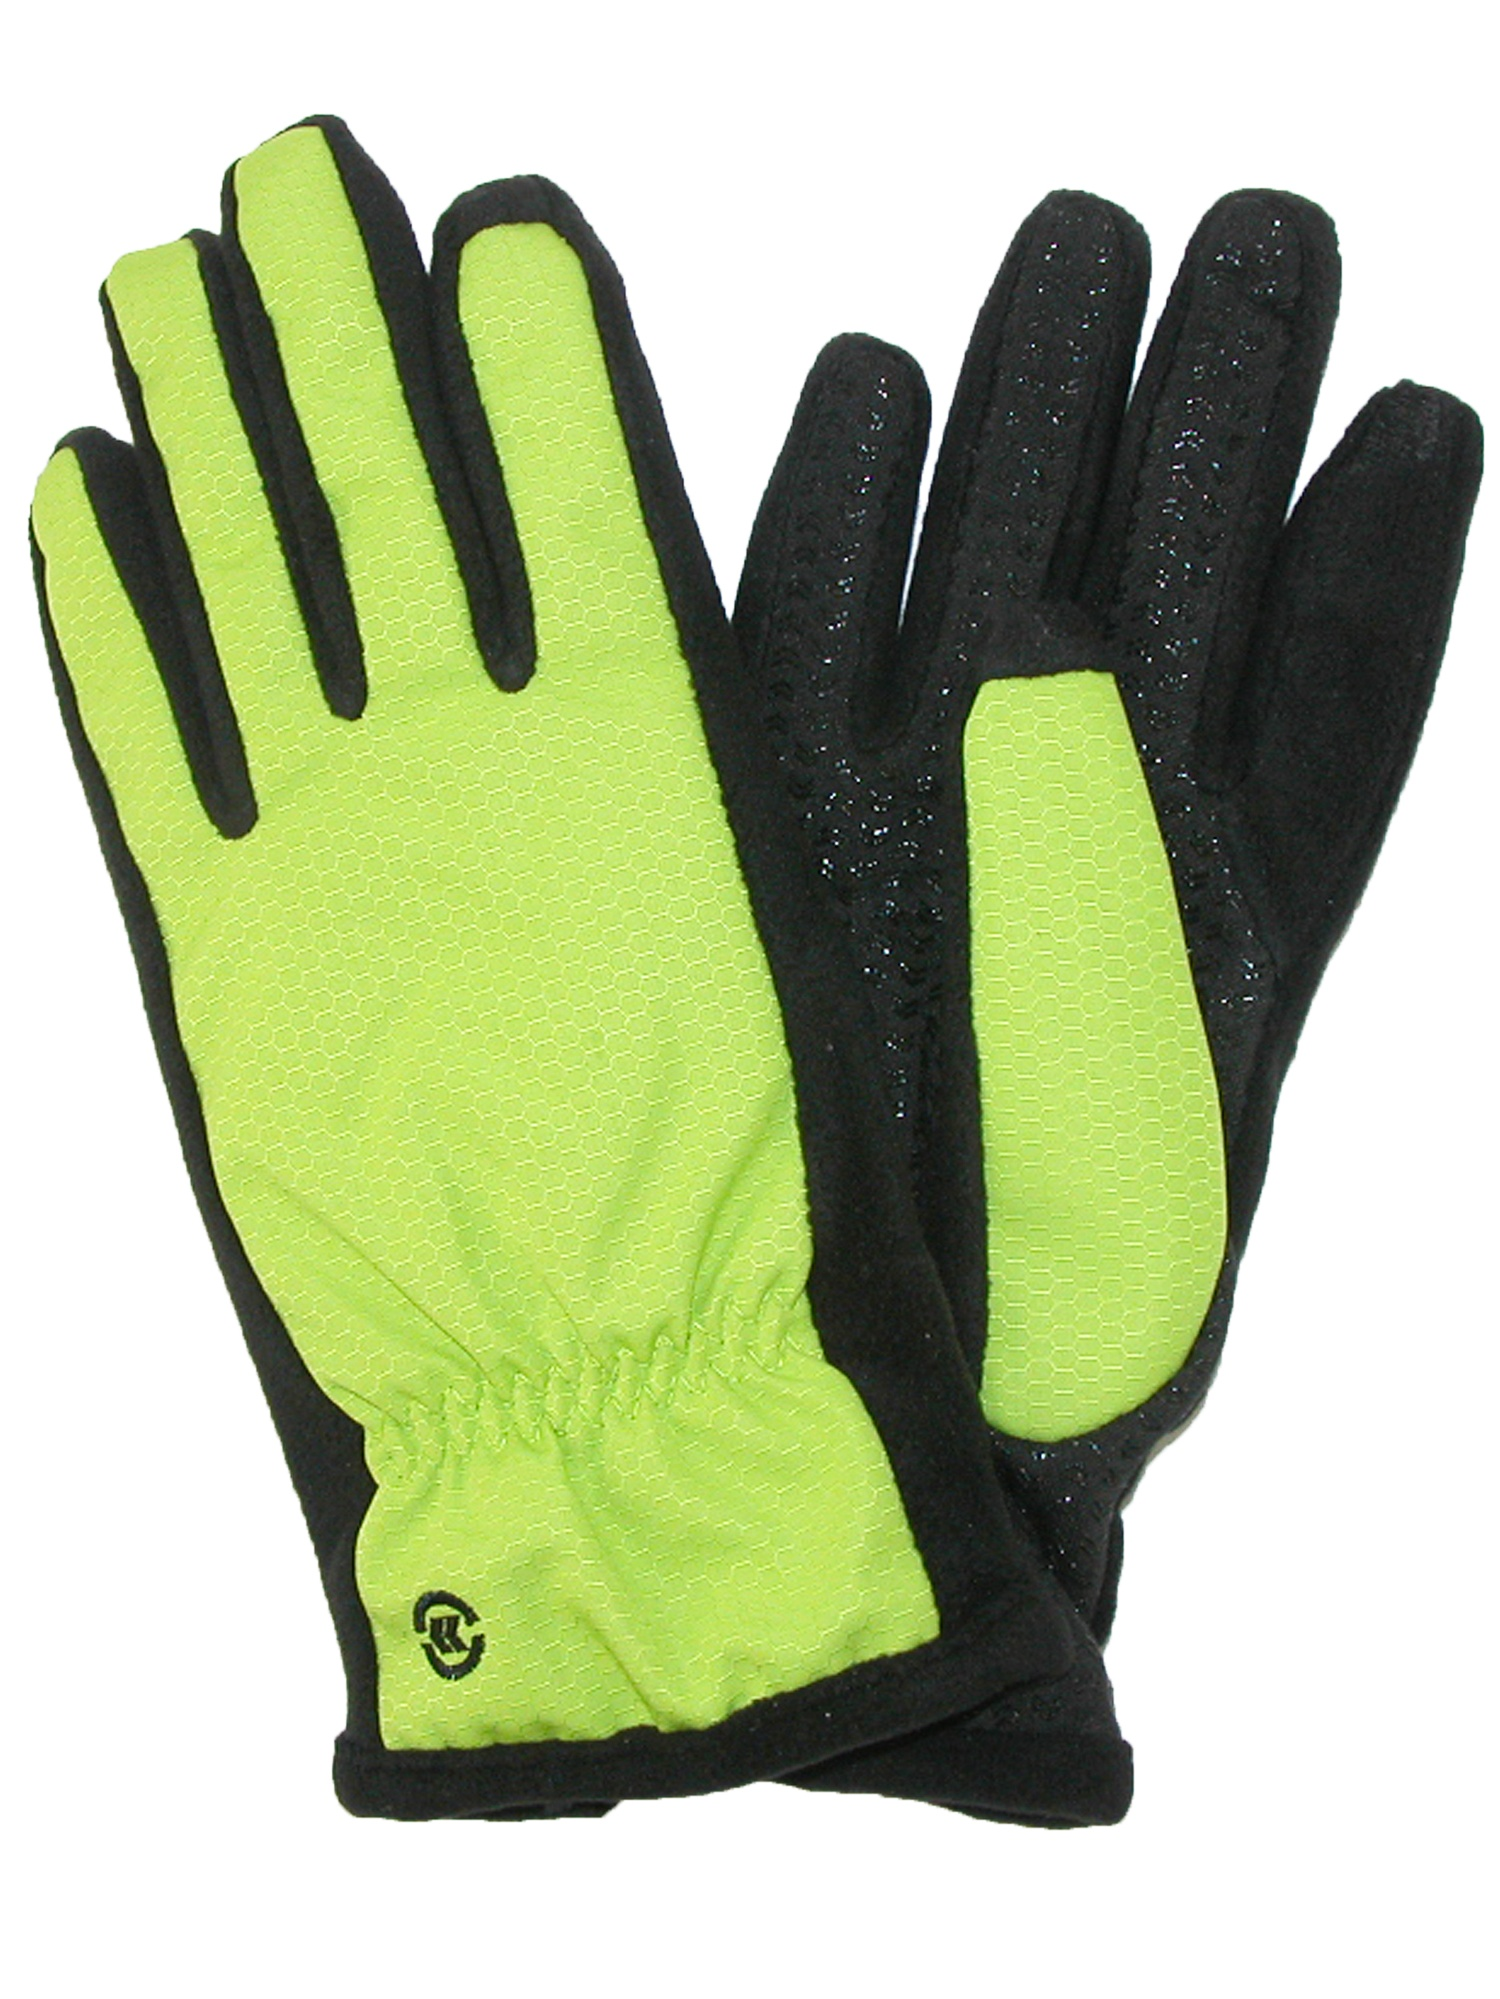 Women's Nylon SmarTouch Winter Texting Gloves